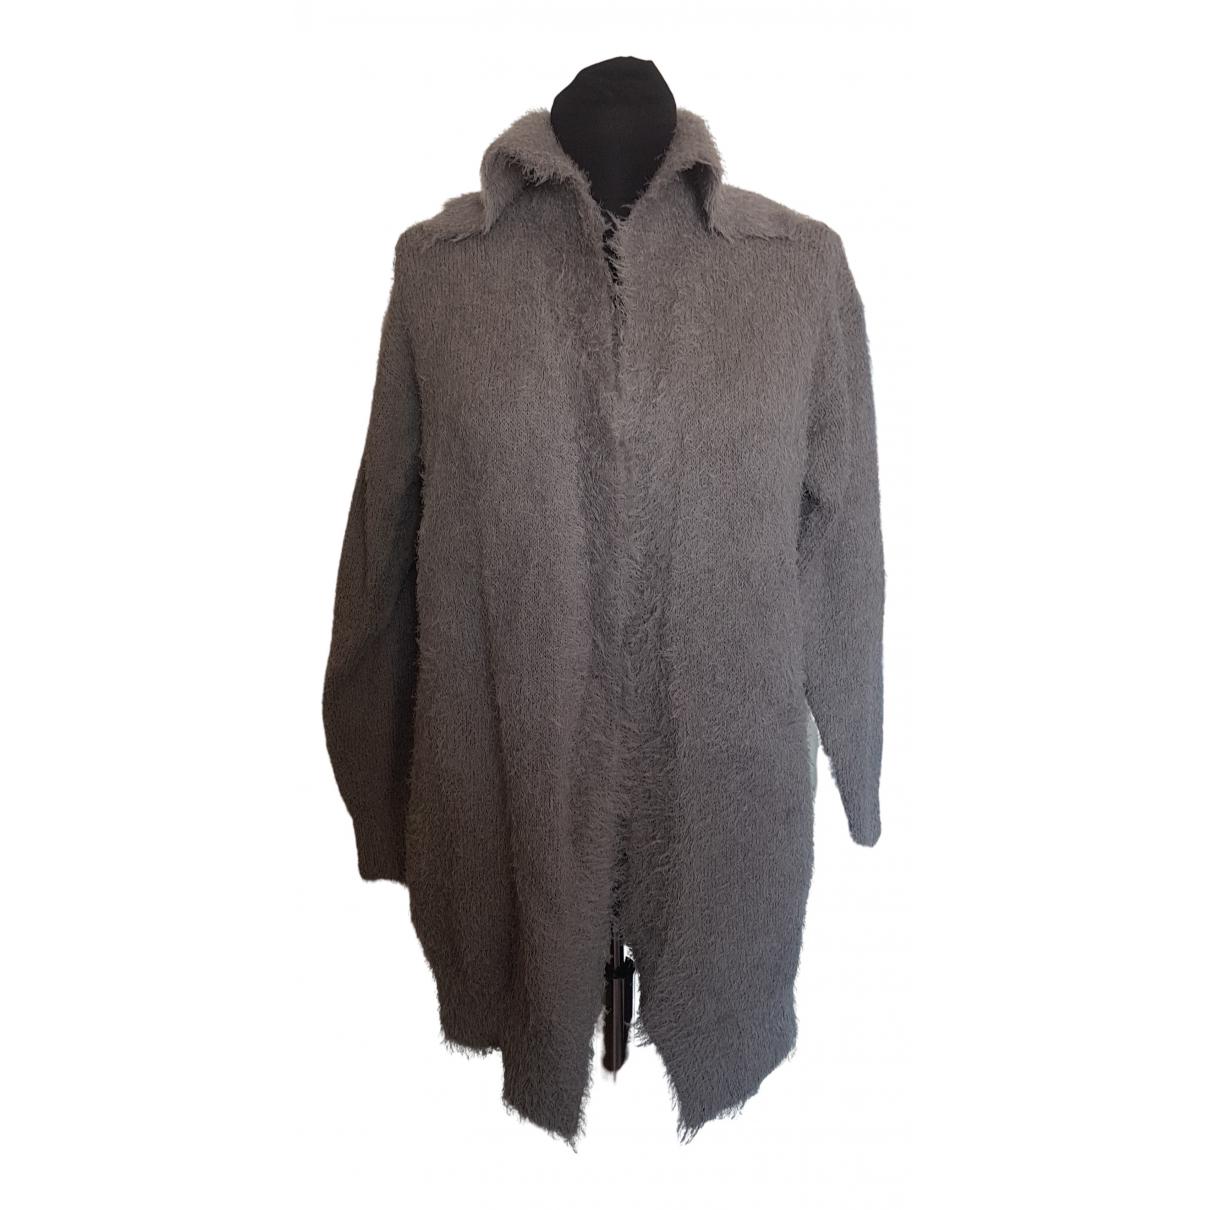 Max Mara 's \N Grey Cotton Knitwear for Women M International